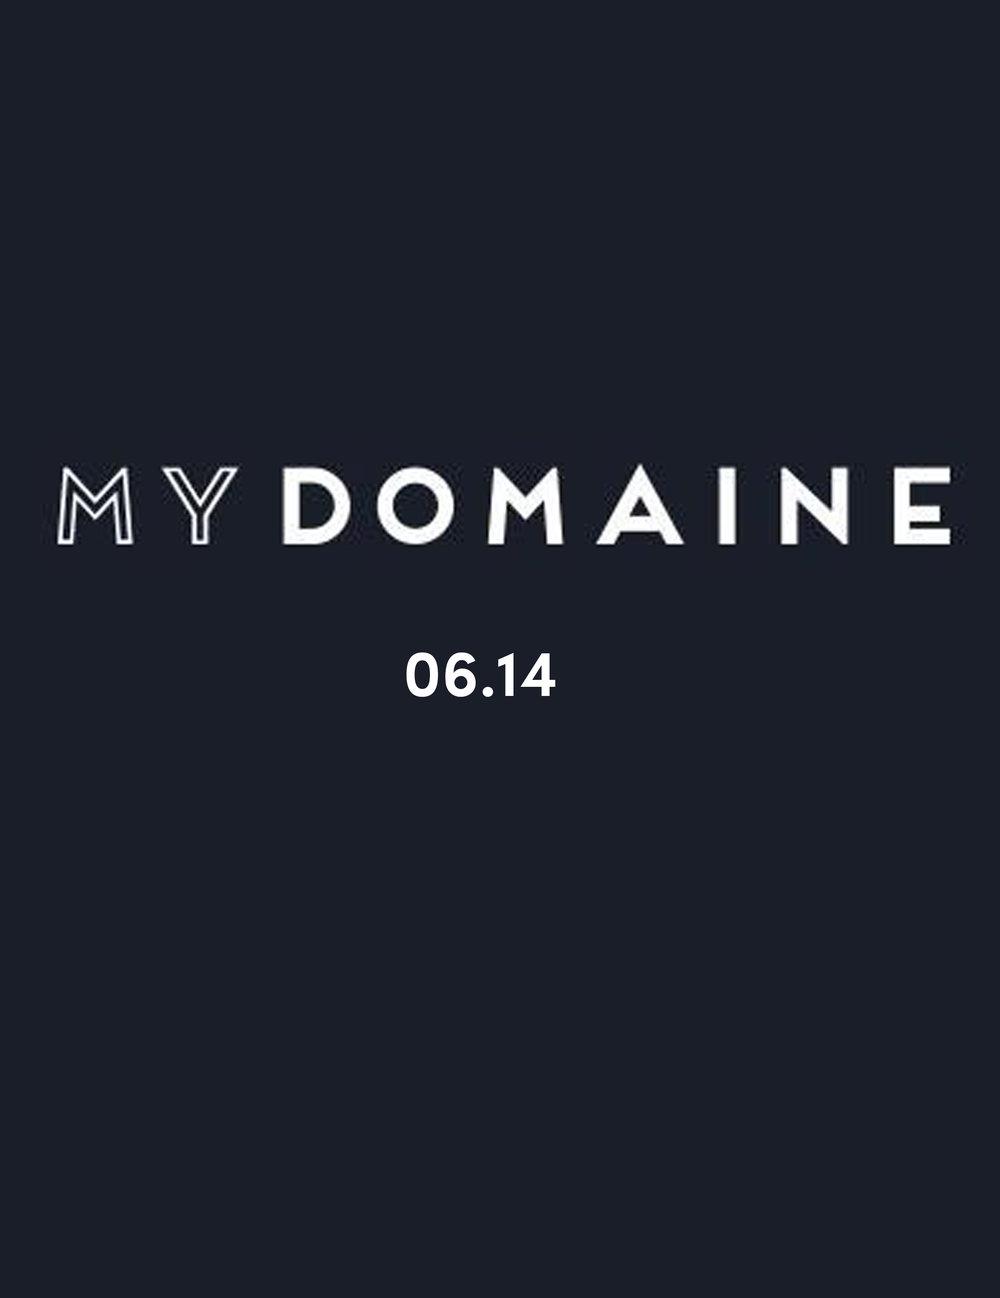 MyDomiane-Cover-Navy-05.15.jpg